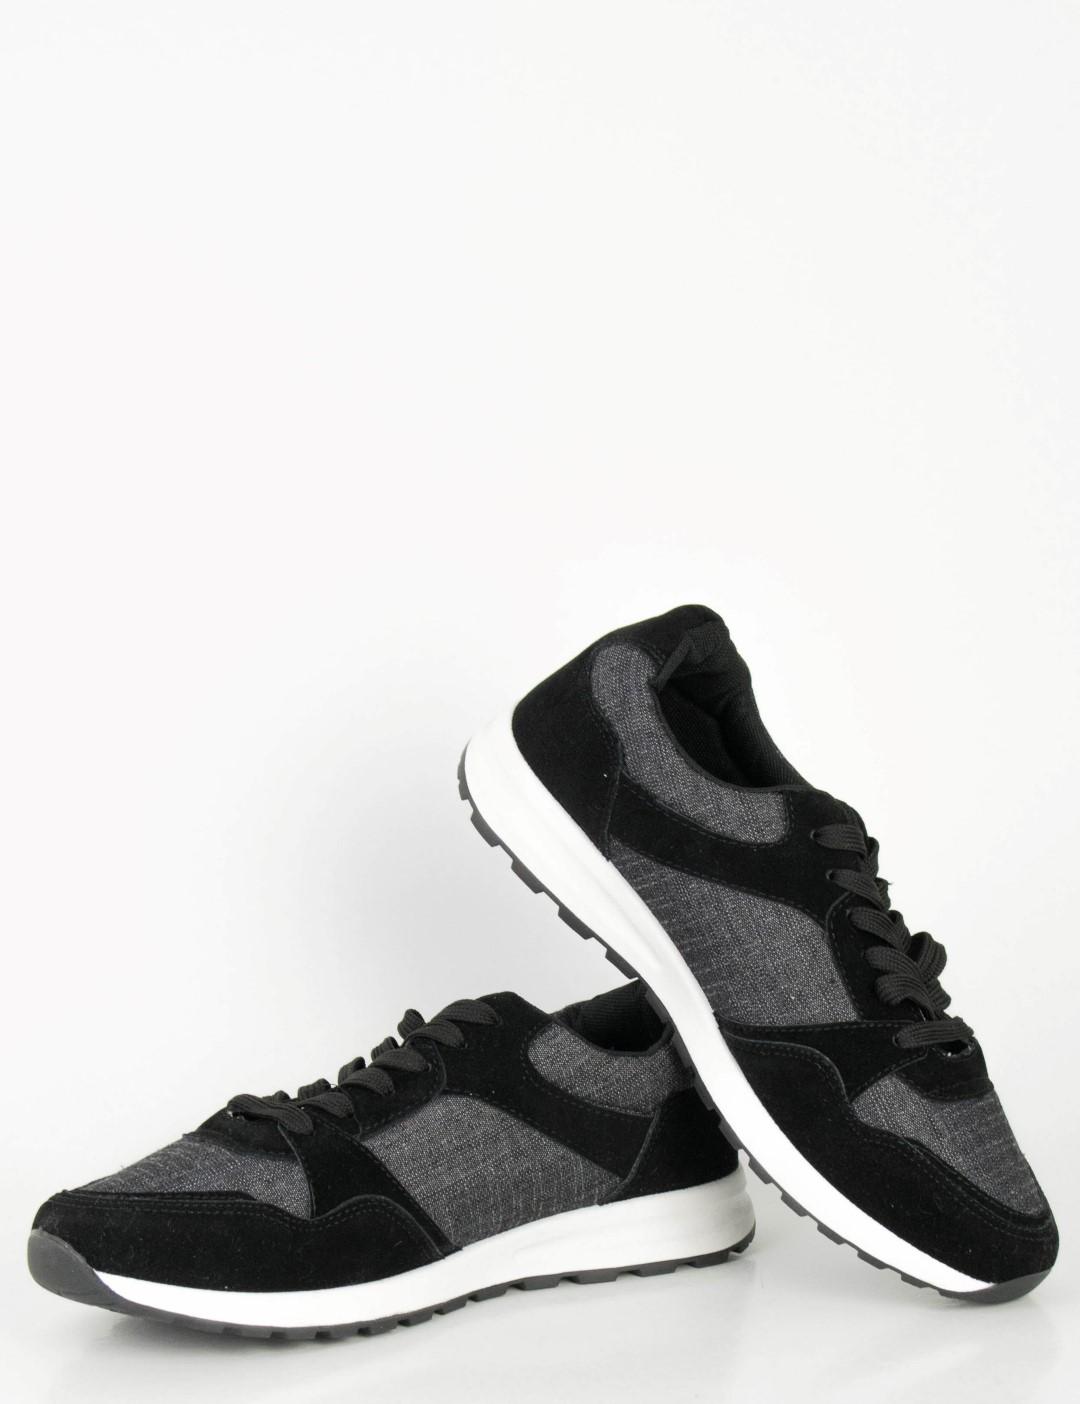 84c9ecc07ba Ανδρικά μαύρα Sneakers με κορδόνια και διχρωμία B15353L